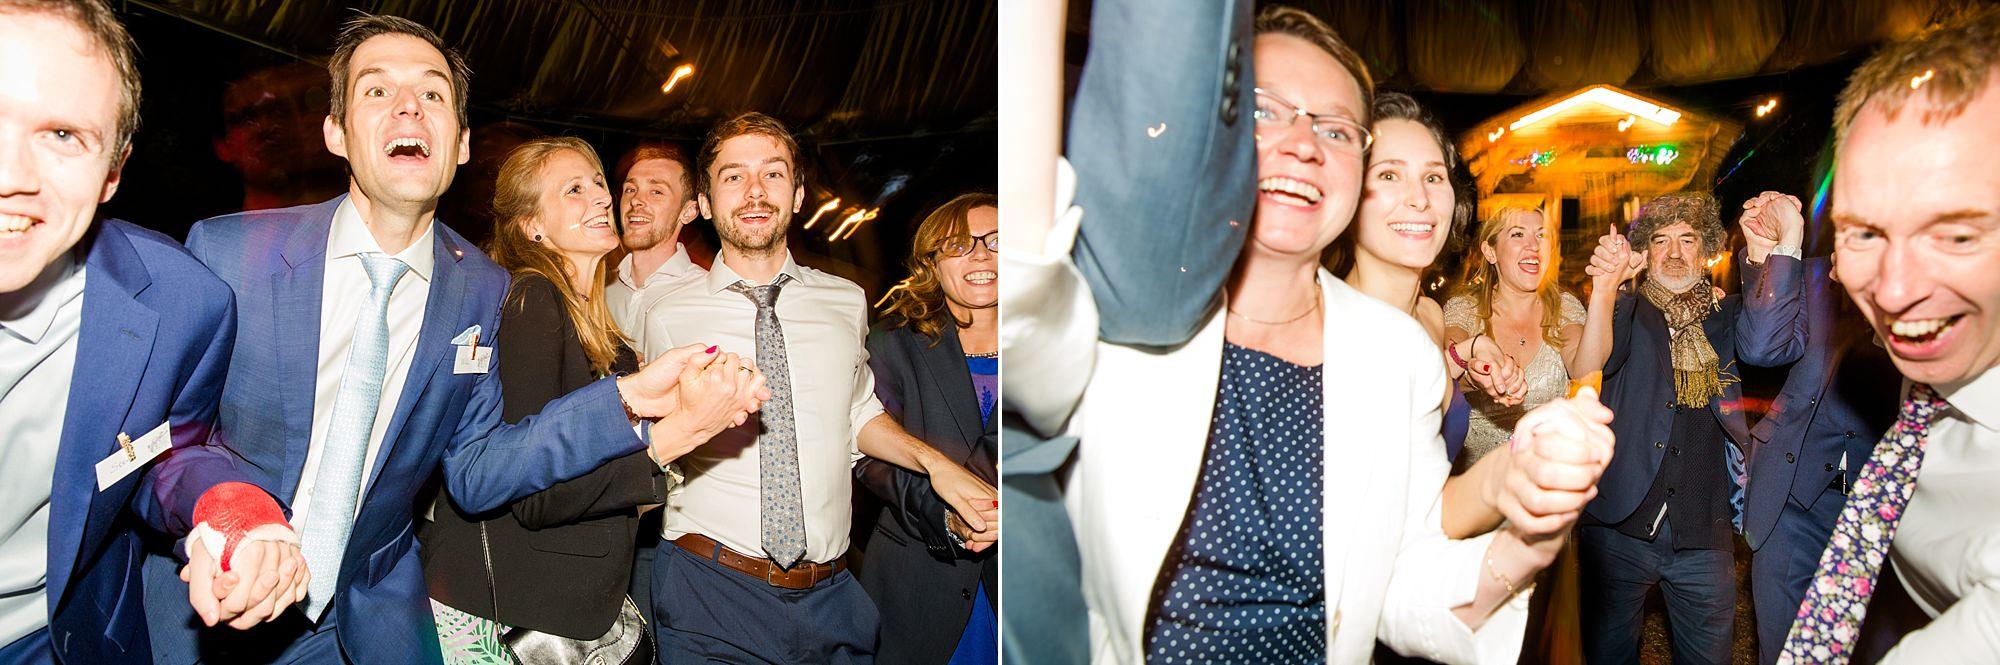 Woodland Weddings Tring crazy guests dancing